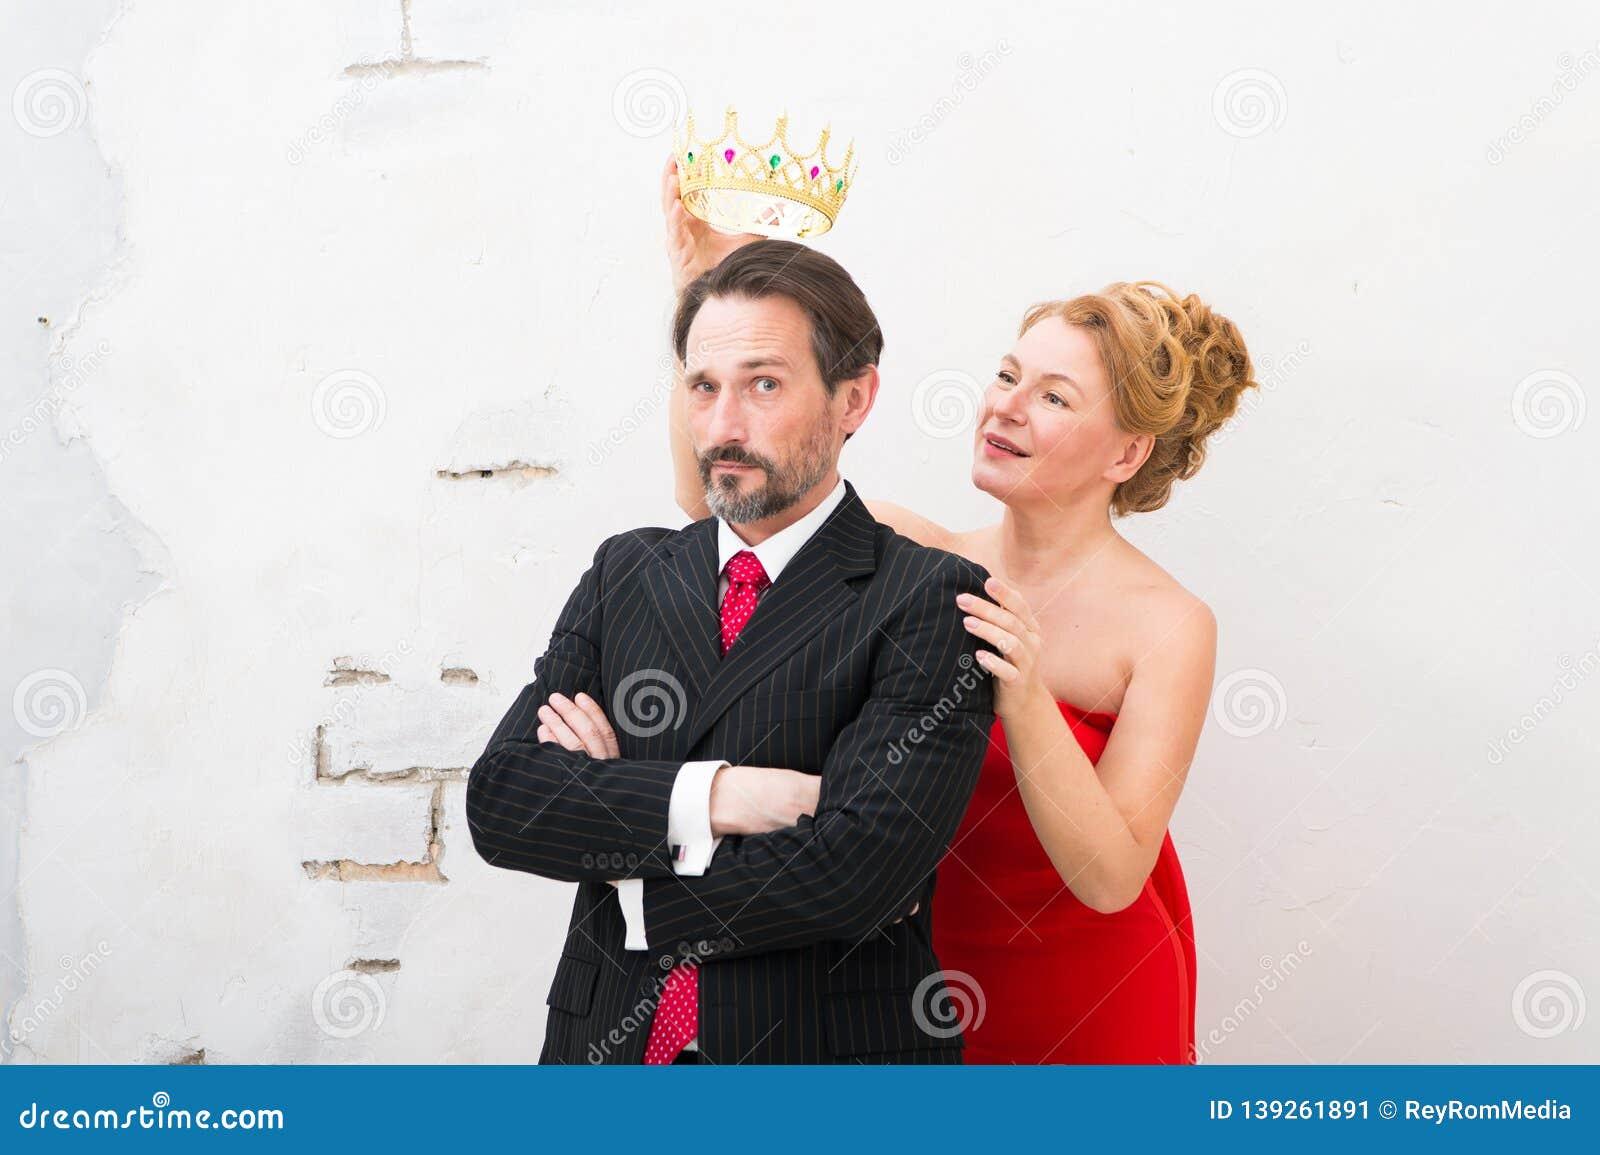 Waist up of elegant woman holding golden crown above her mans head